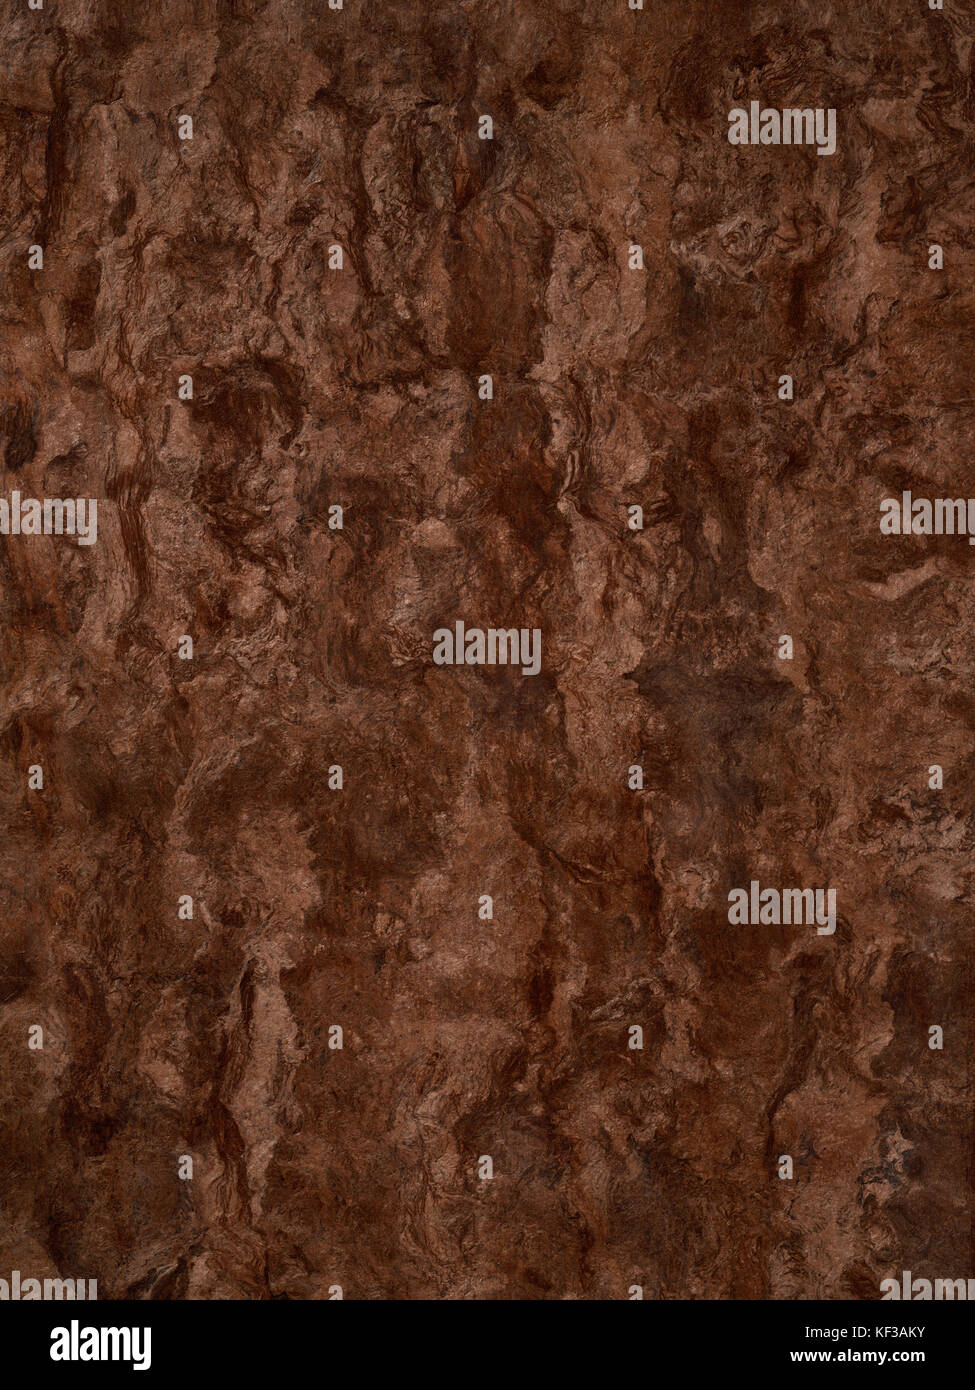 Organic brown cork wood background texture - Stock Image